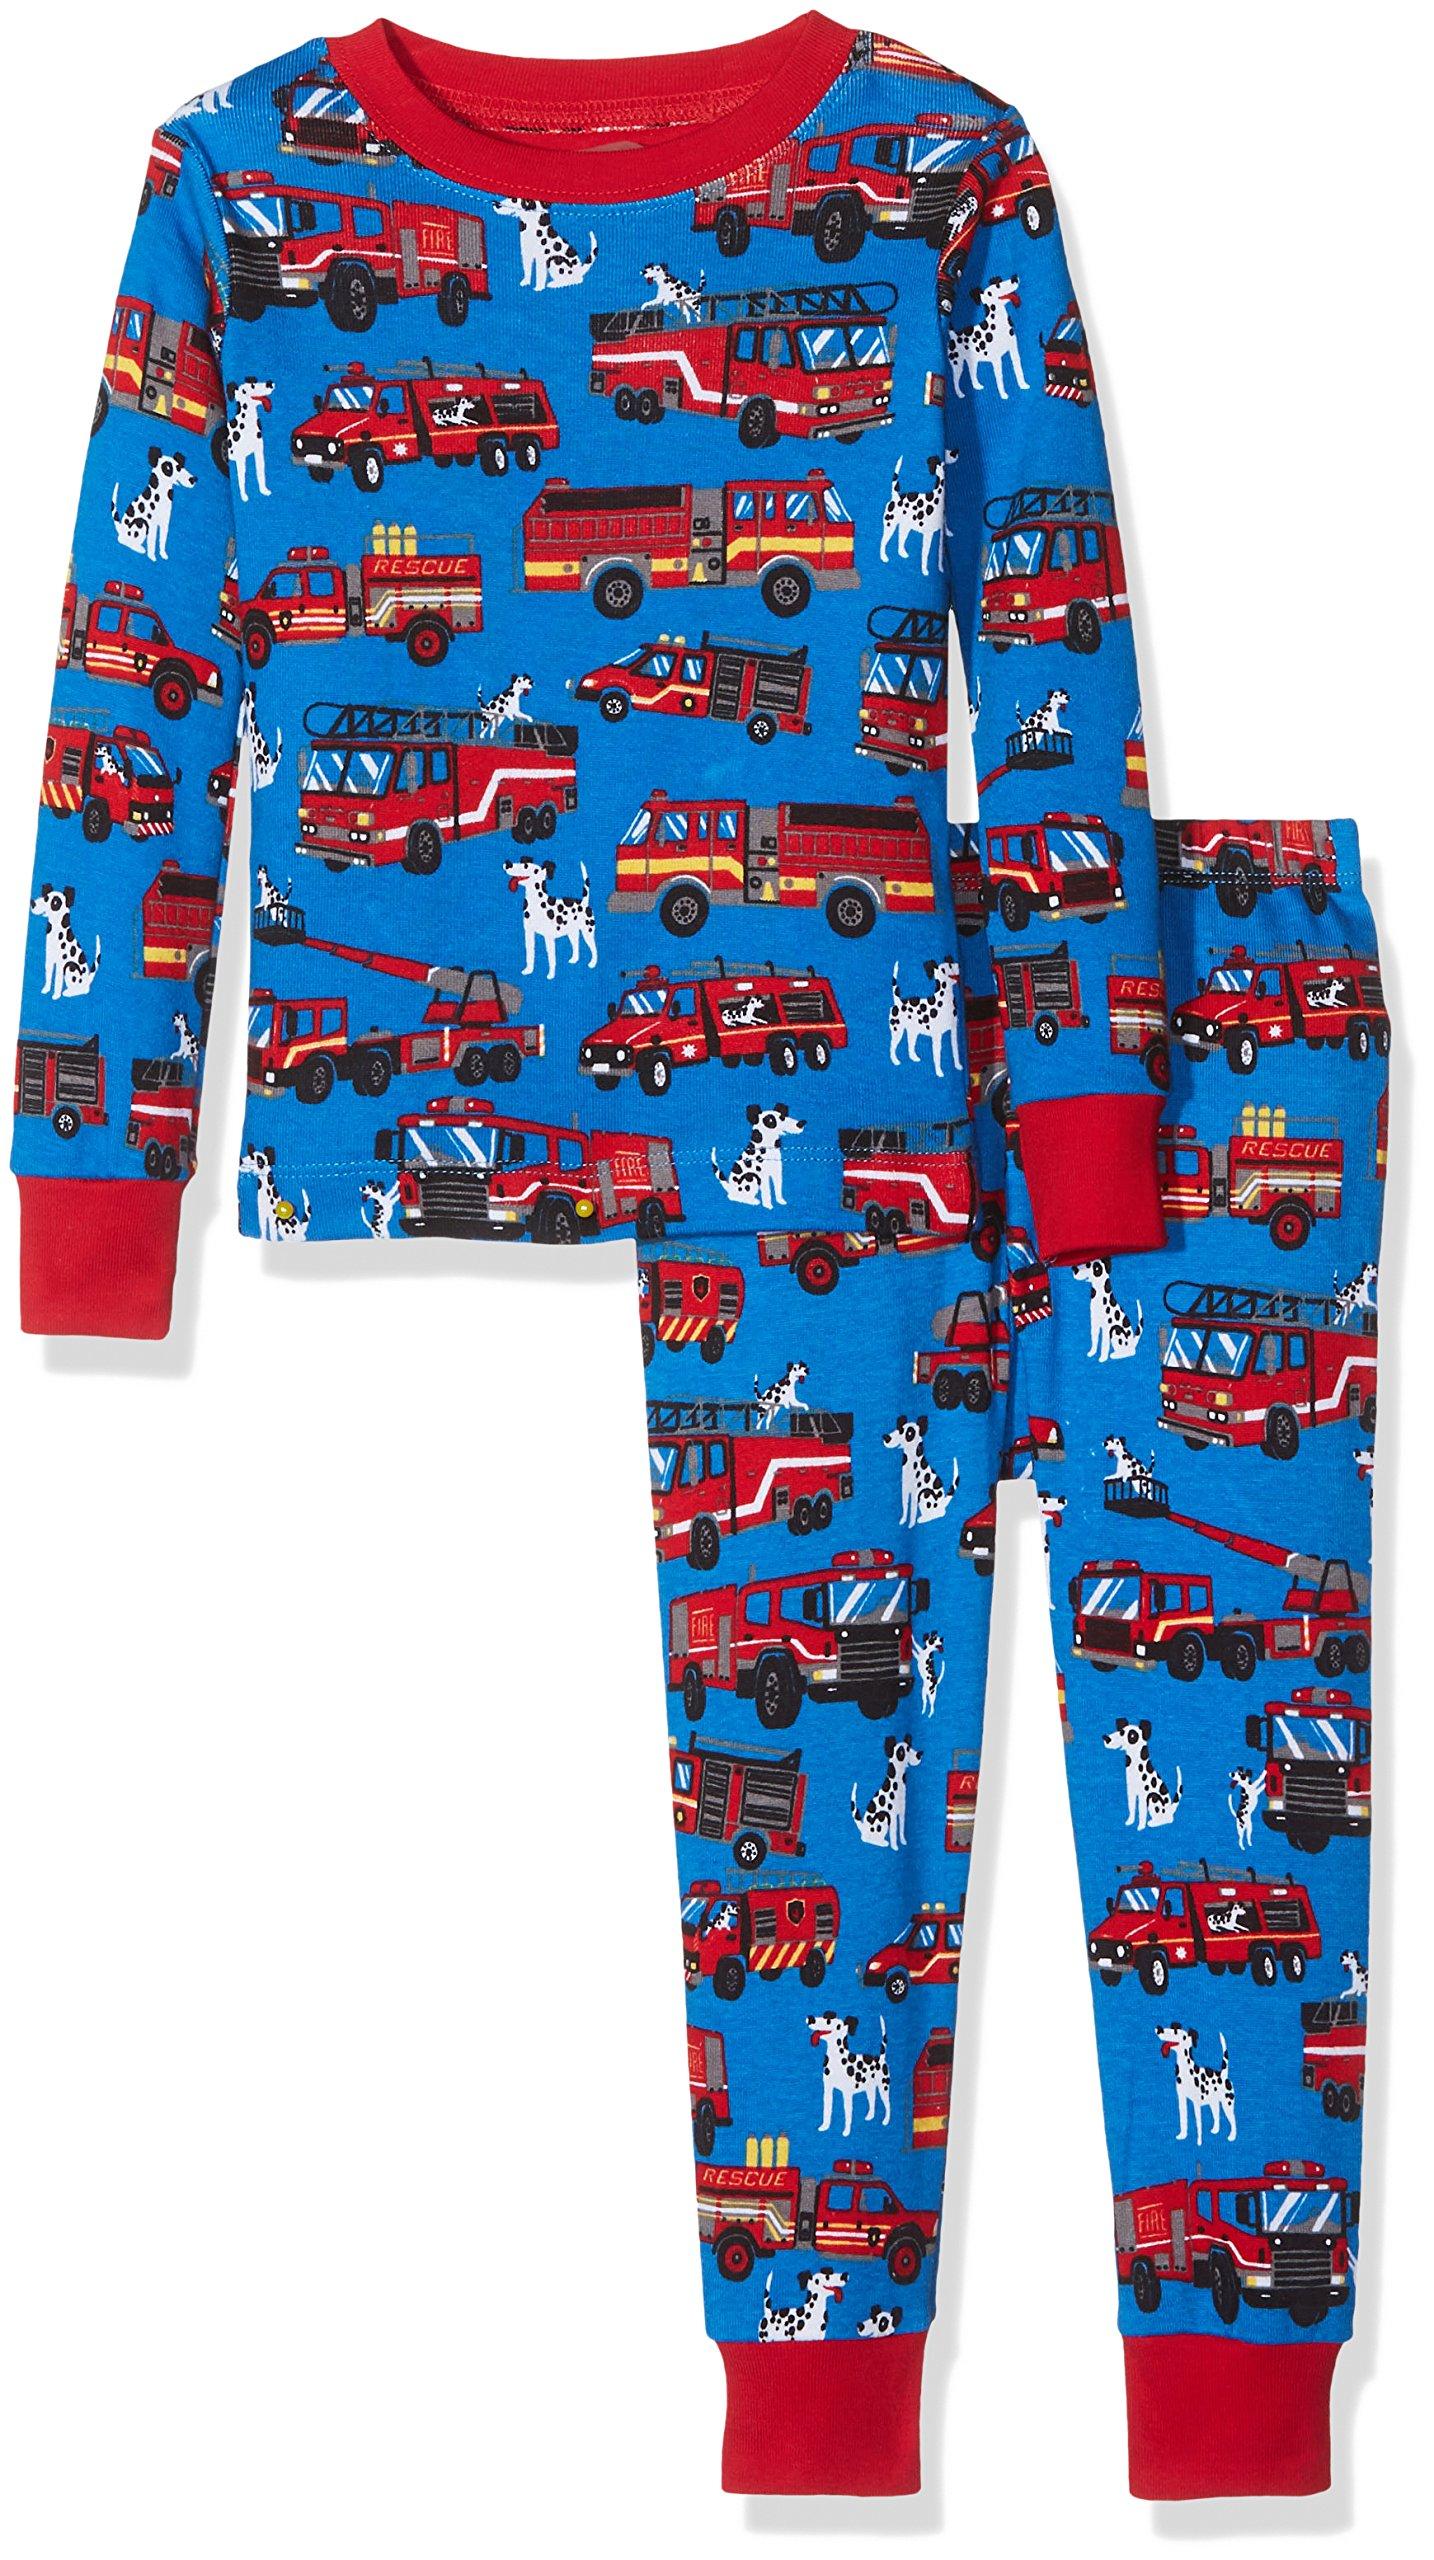 Hatley Boys' Big Organic Cotton Long Sleeve Printed Pajama Sets, Fire Trucks, 7 Years